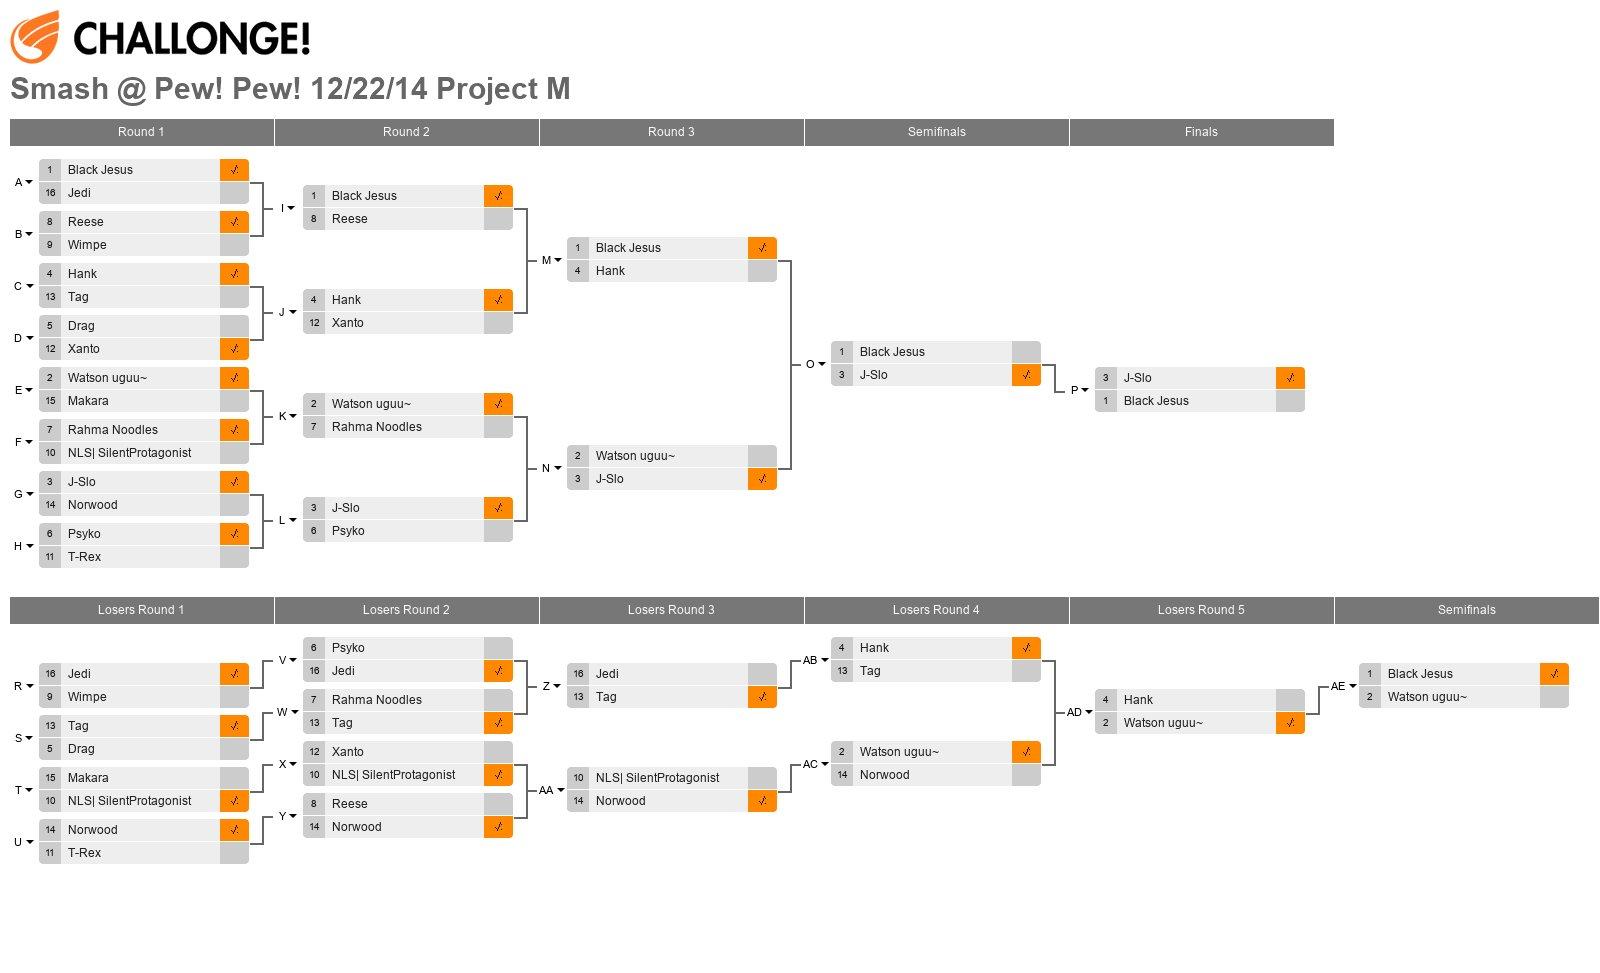 Smash @ Pew! Pew! 12/22/14 Project M